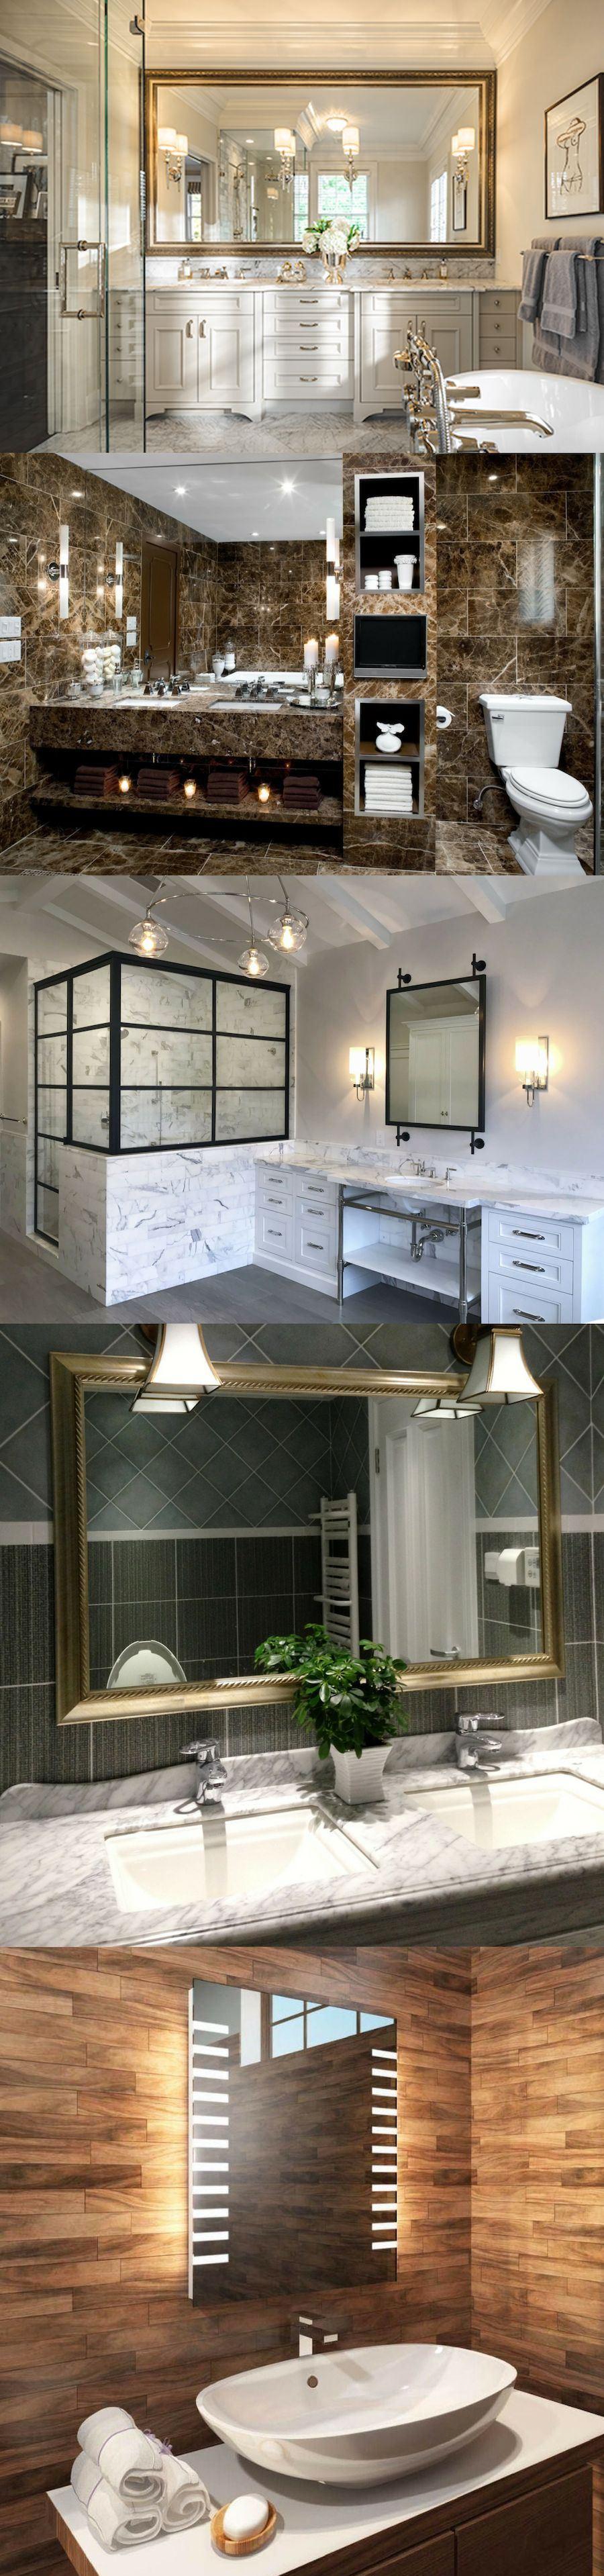 framed bathroom mirrors over vanity